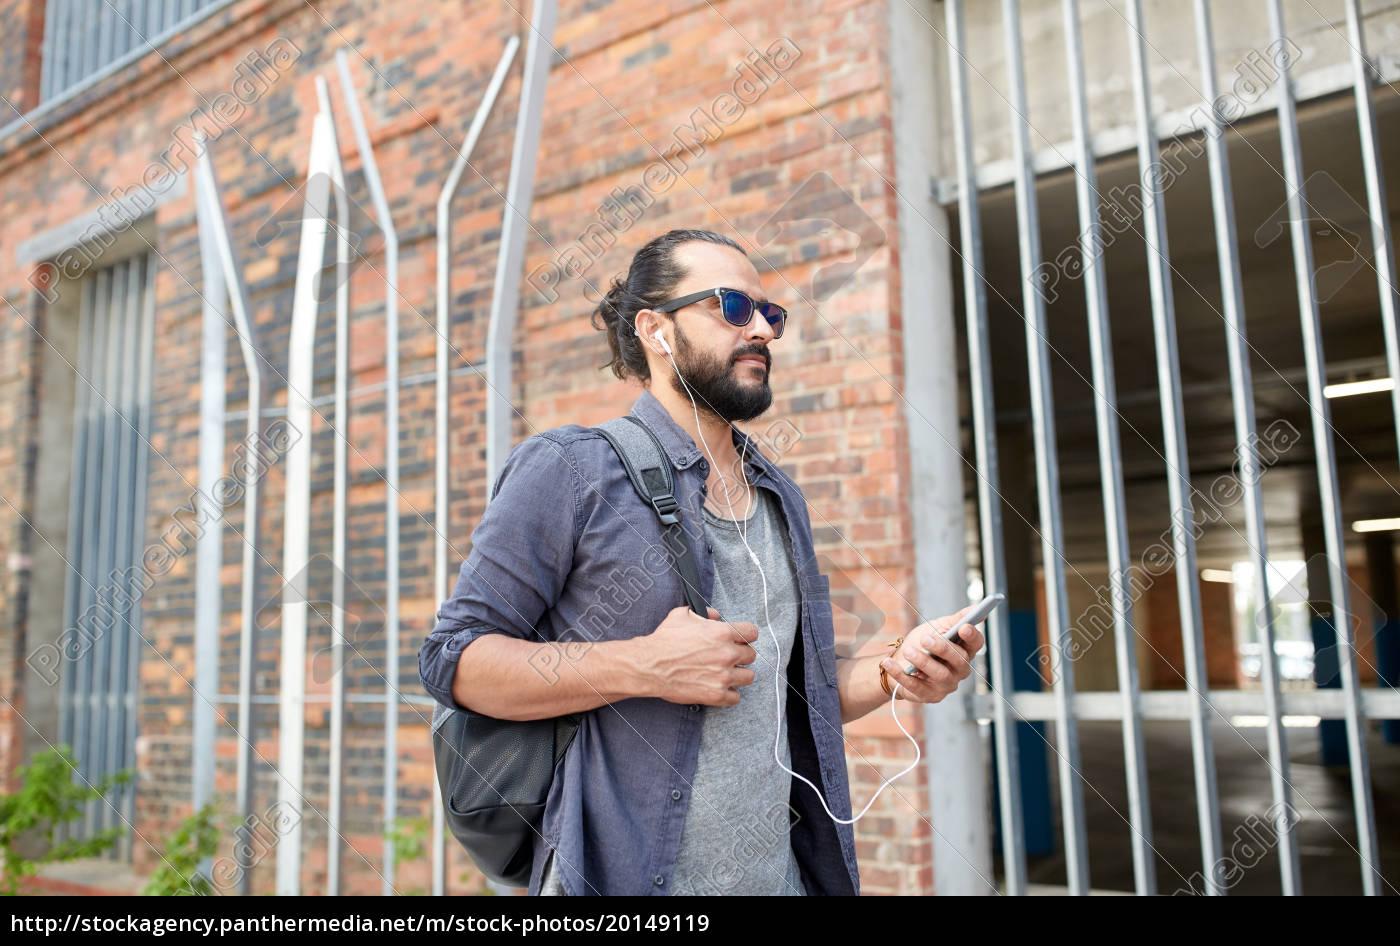 man, with, earphones, and, smartphone, walking - 20149119